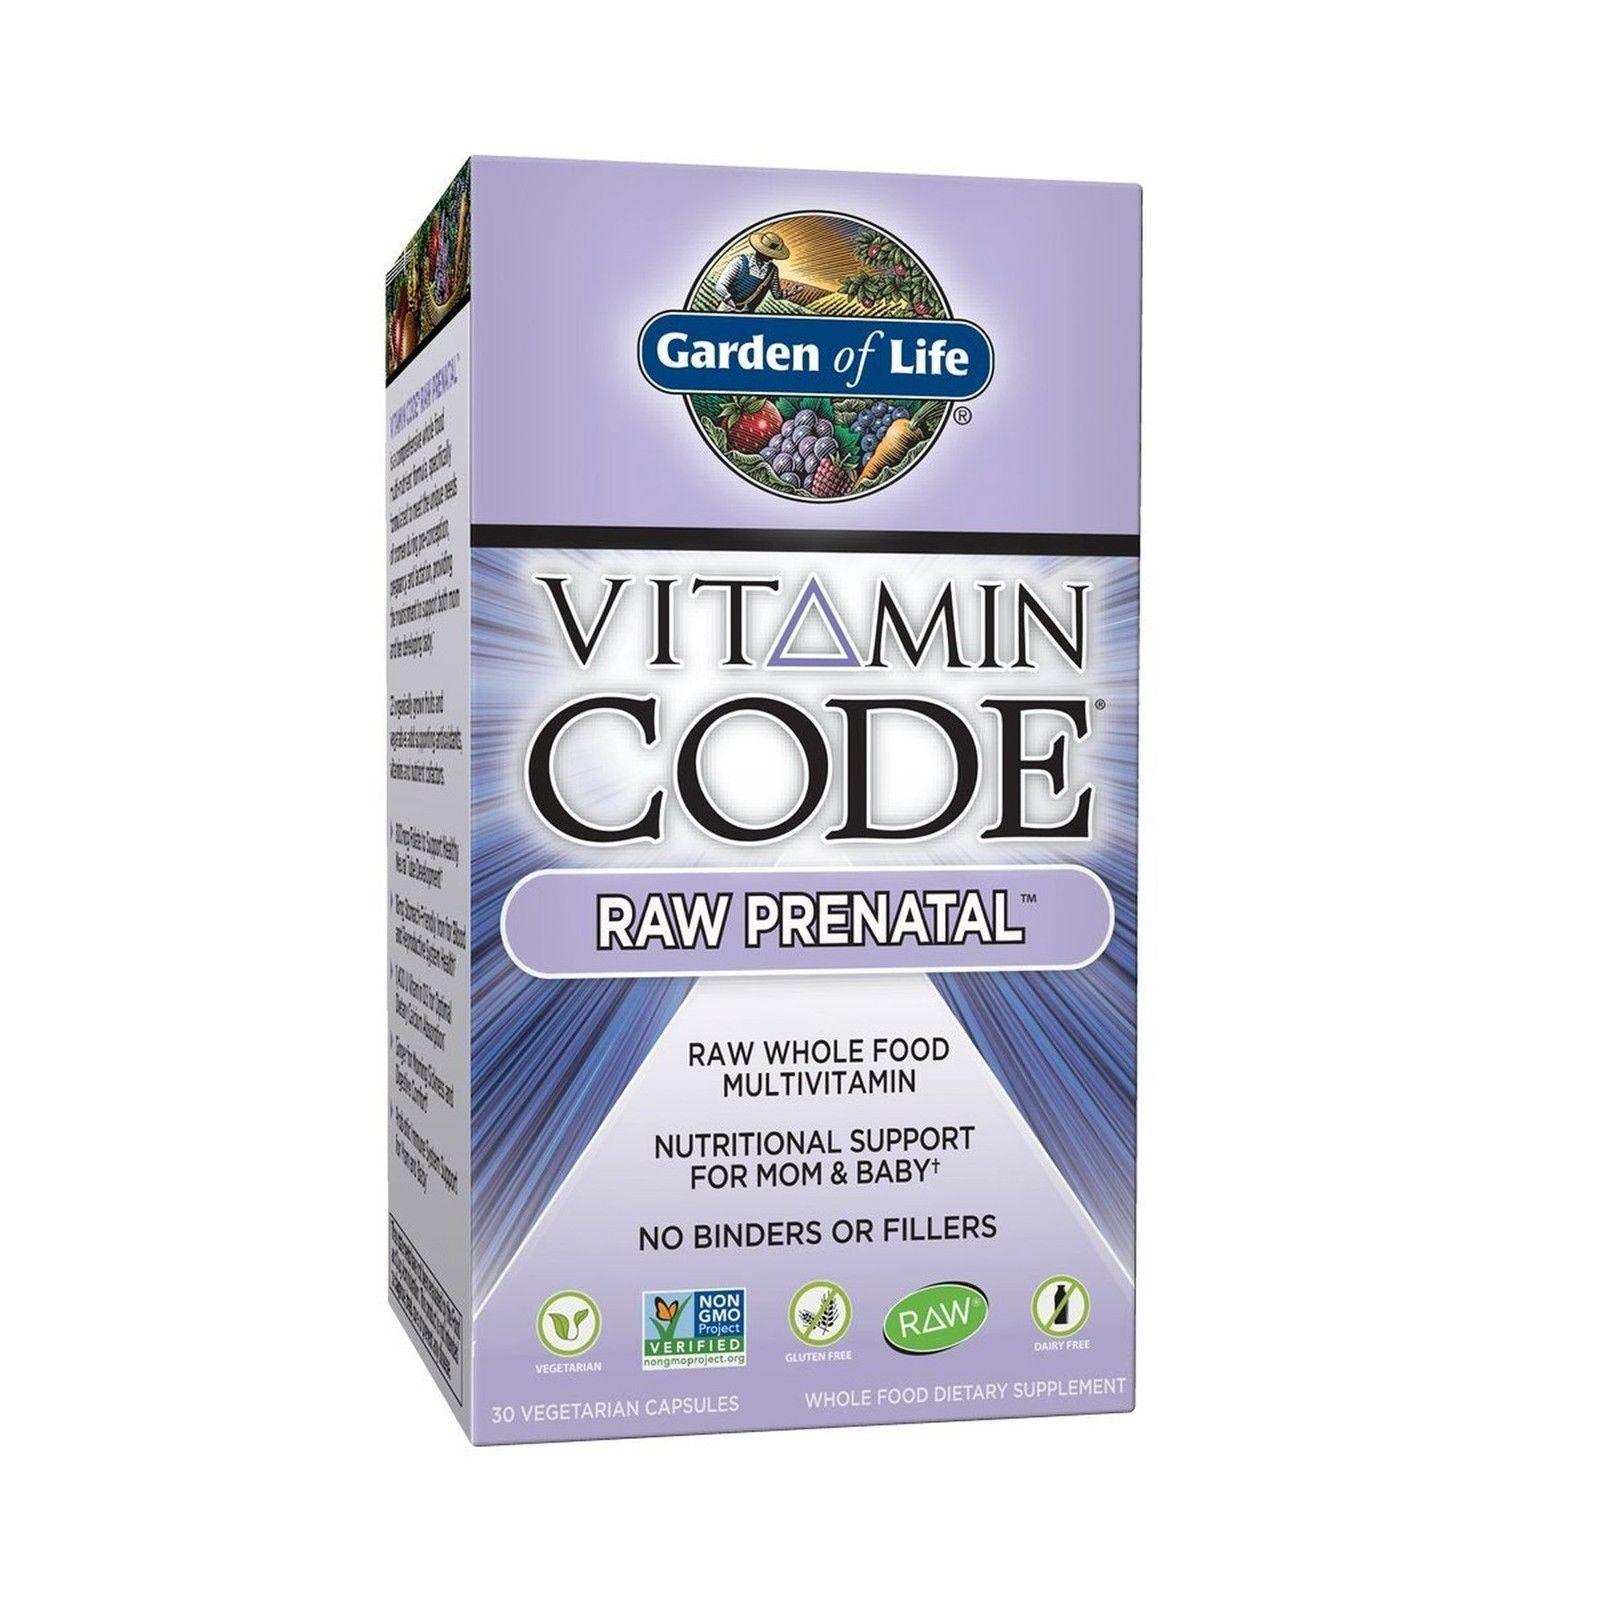 garden of life prenatal vitamins vitamin code raw prenatal wh free shipping - Garden Of Life Prenatal